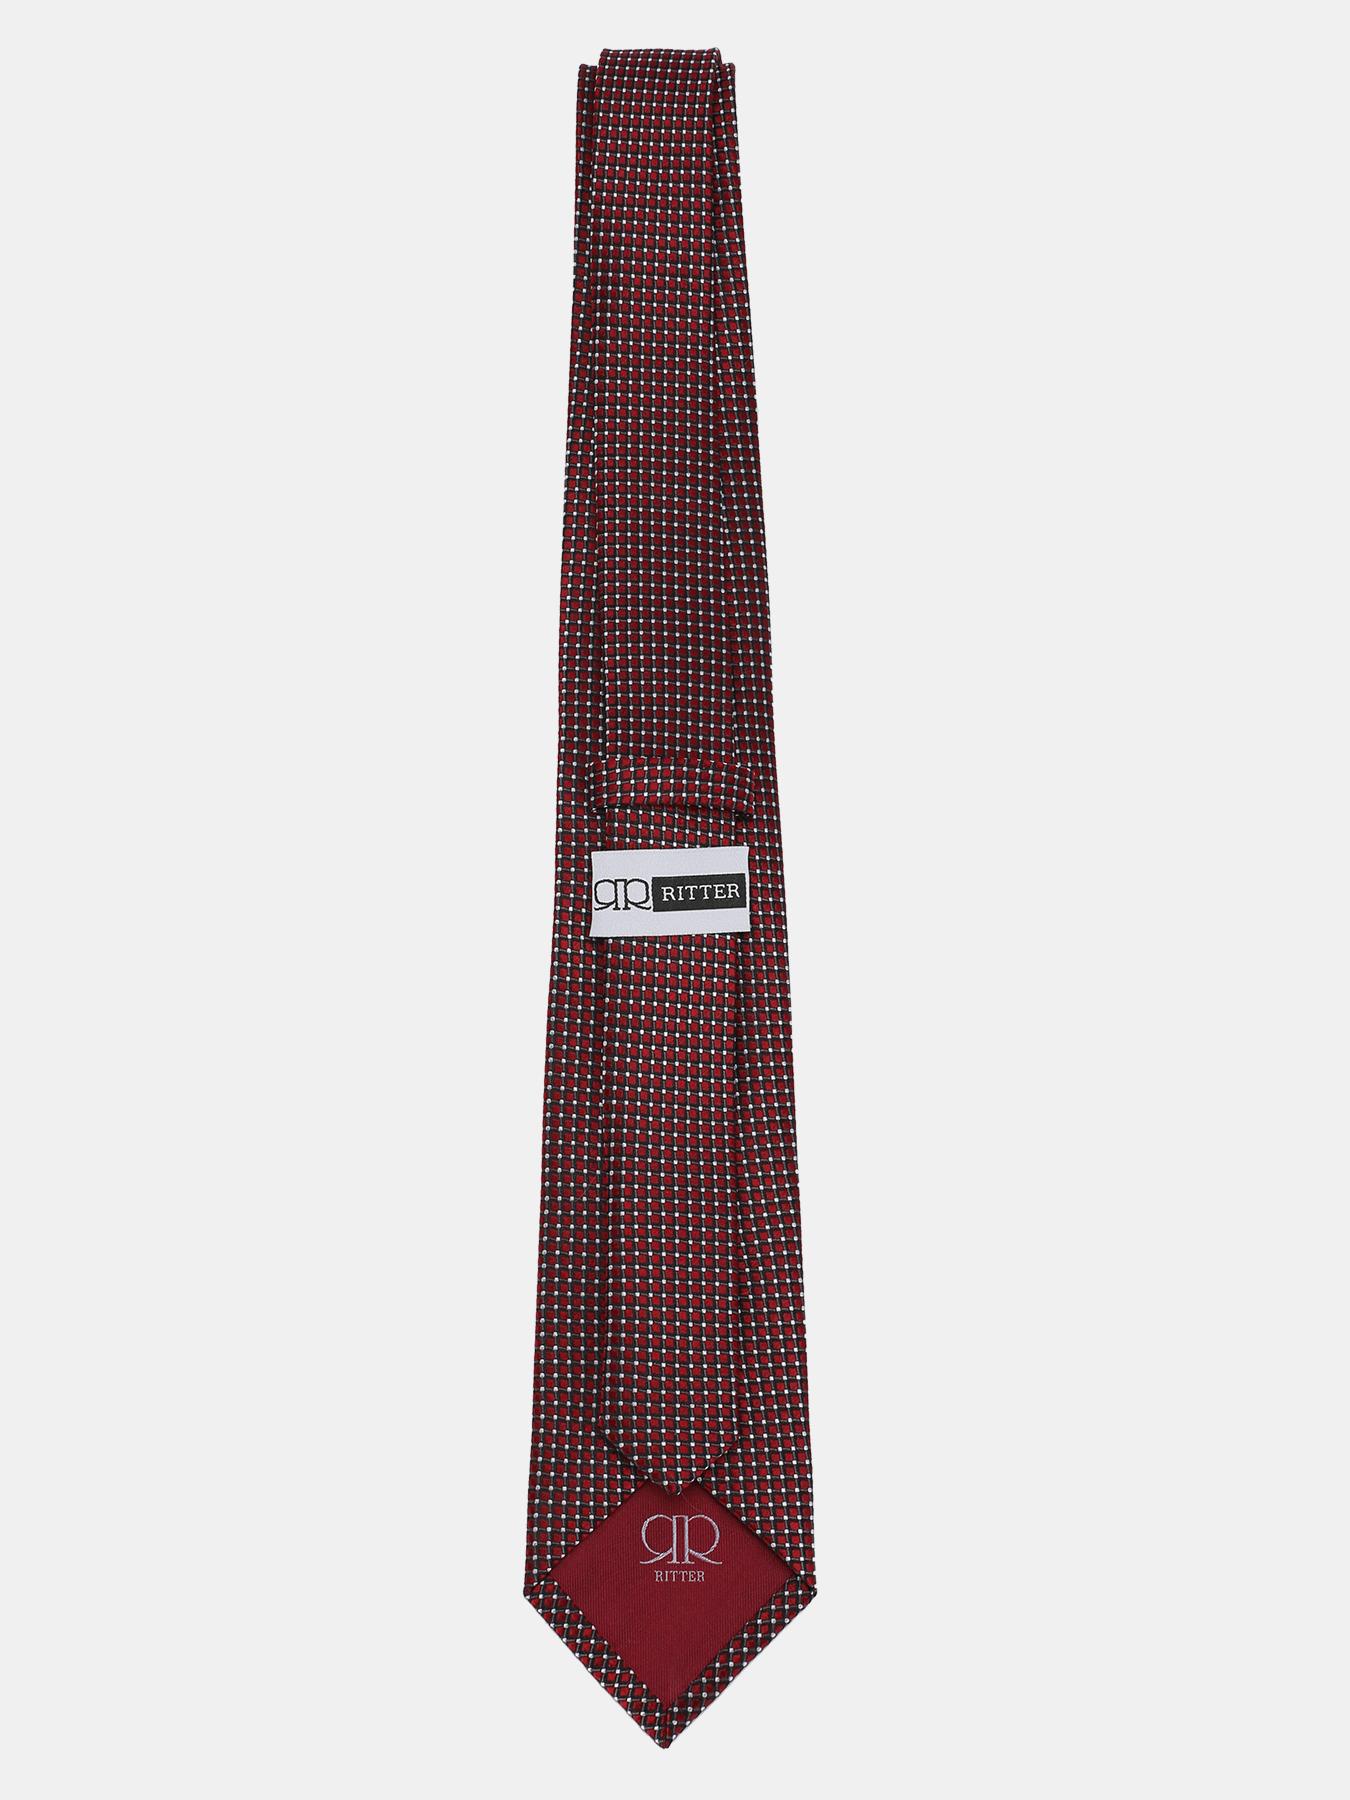 Ritter Шелковый галстук 312369-185 Фото 2